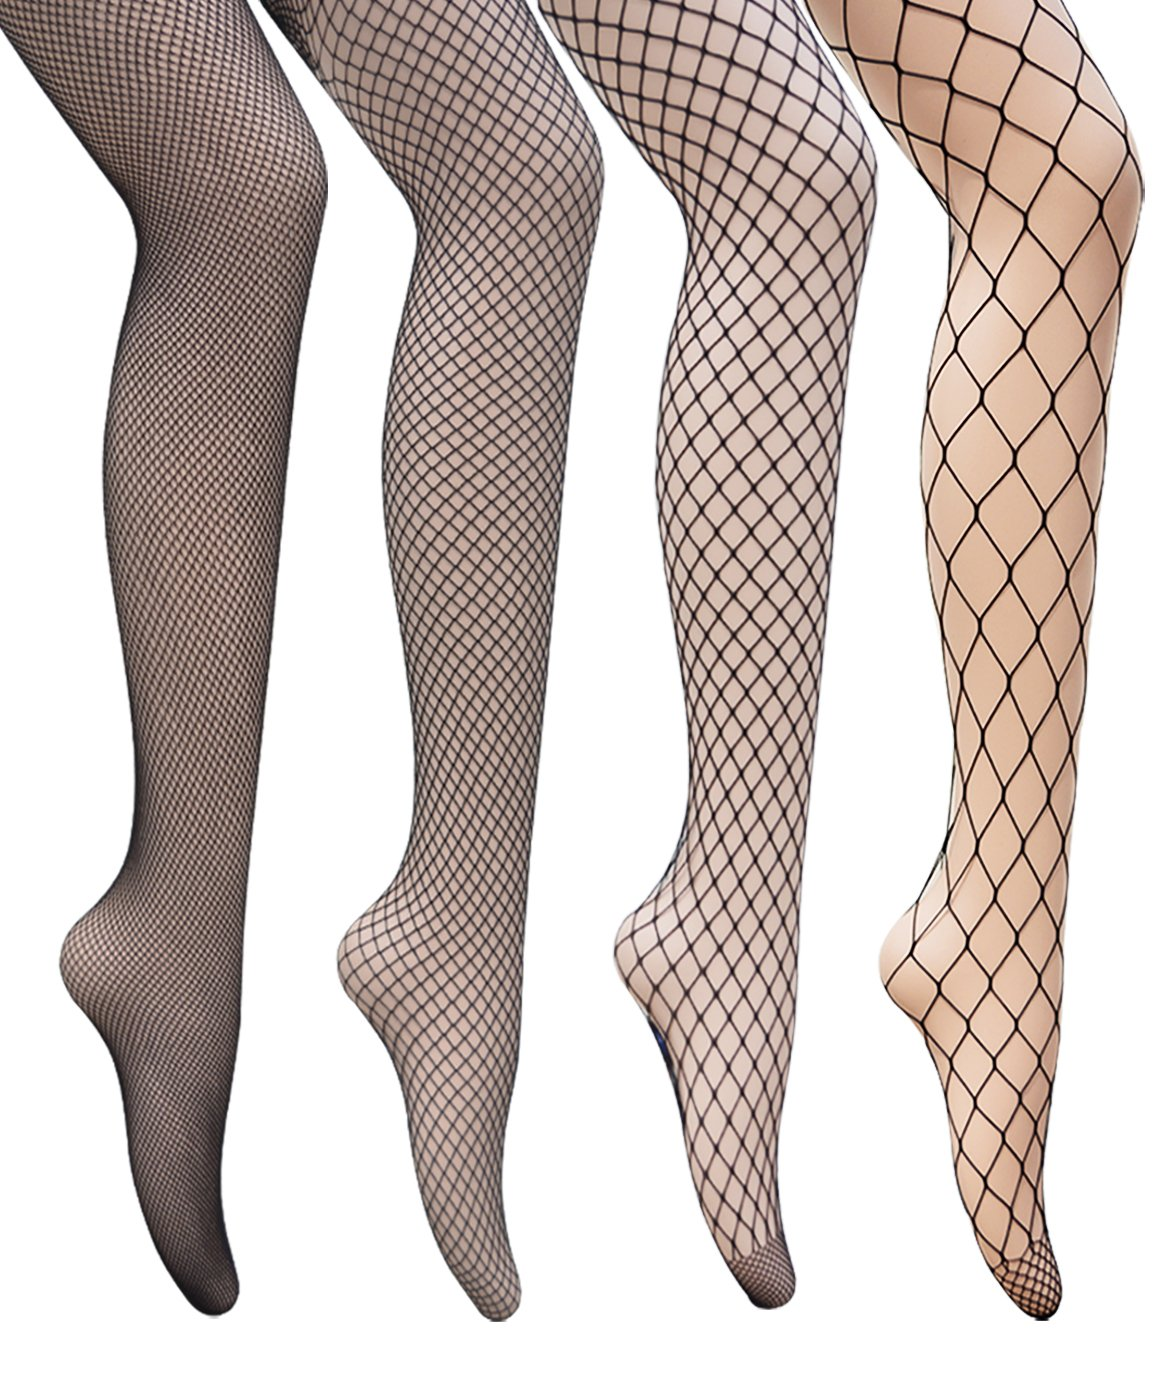 dreshowフィッシュネットストッキングパンティーストッキングソックスCrossタイツメッシュタイツコスチュームダンスSeamedの女性パック1 / 4 B06XKS146W 4 Pair Pantyhoses: 4 Style Fishnet 4 Pair Pantyhoses: 4 Style Fishnet